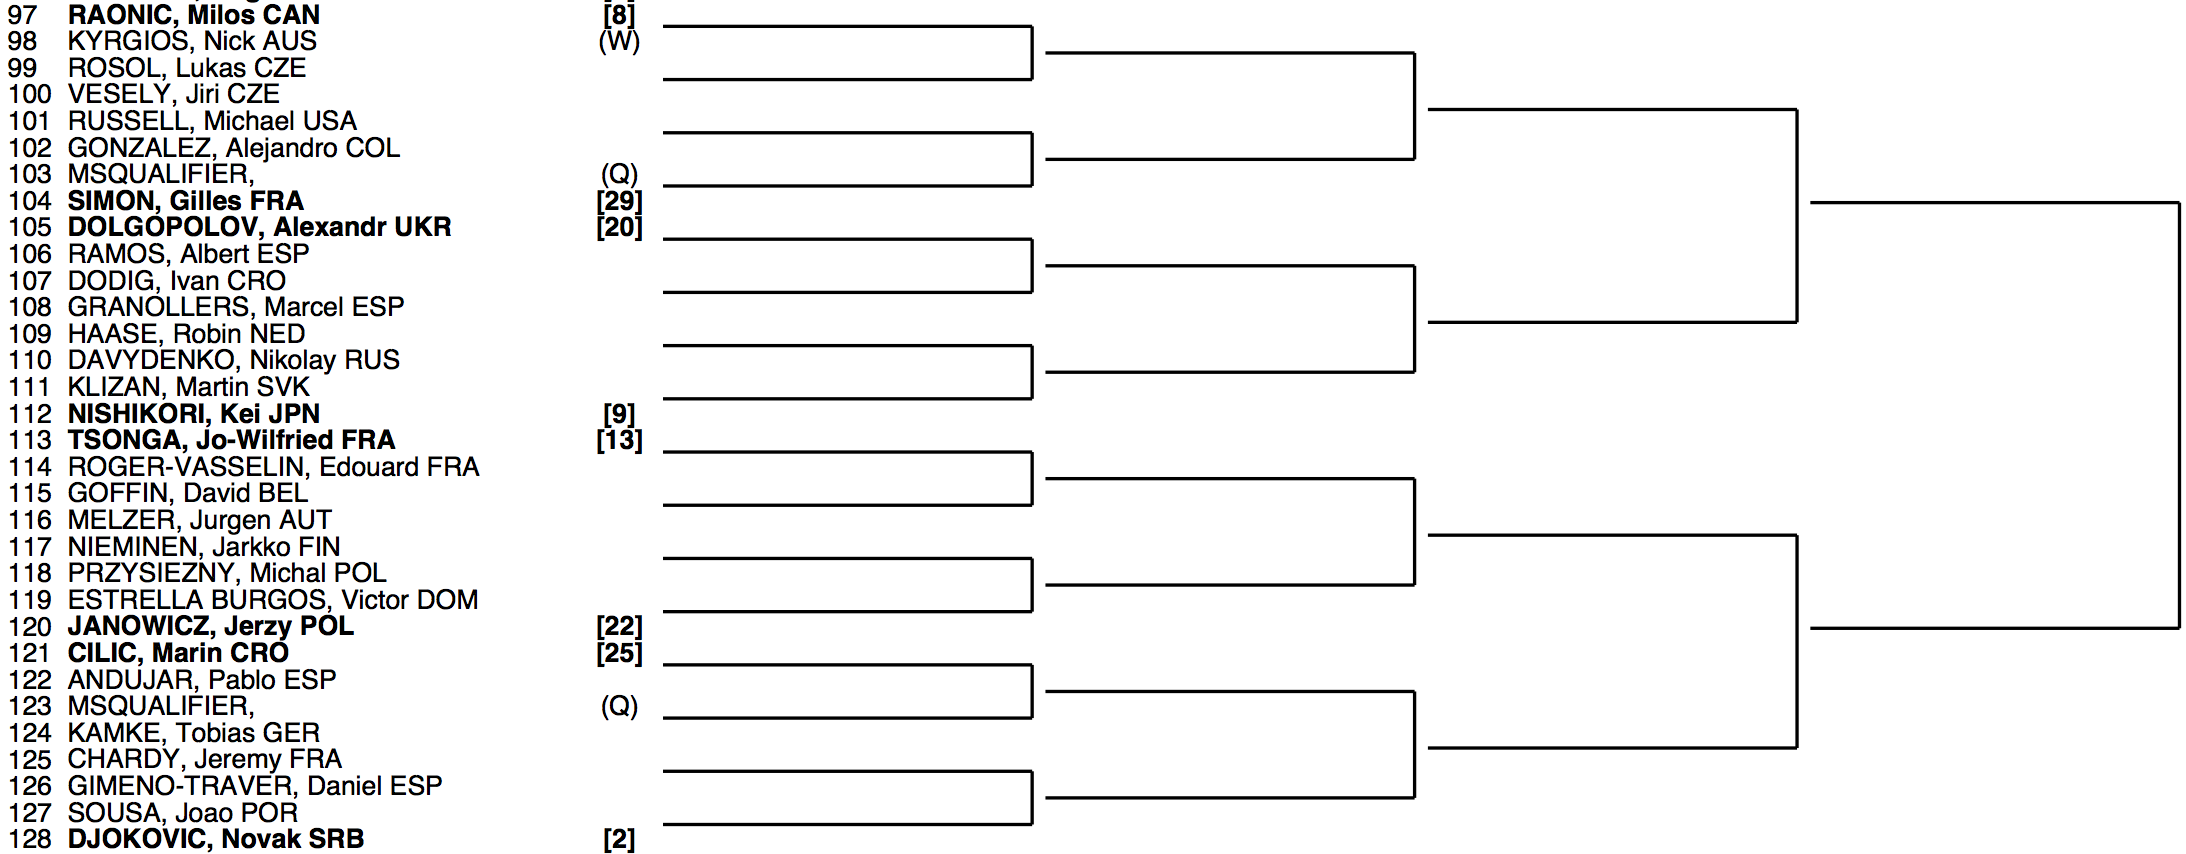 Roland Garros 2014 Draw 4:4